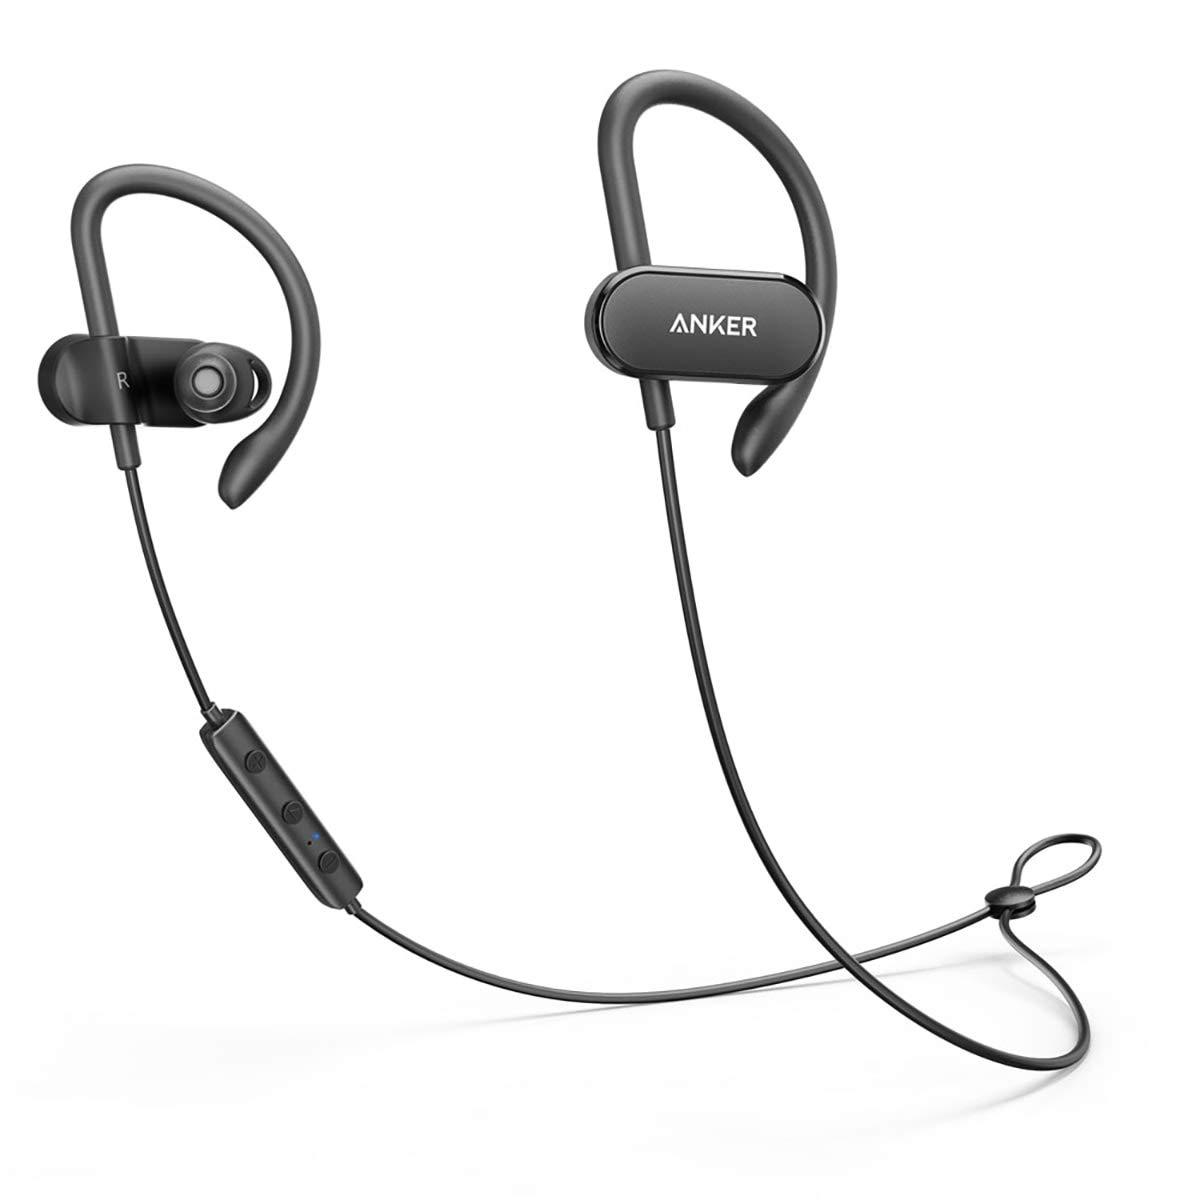 Anker Wireless Headphones2.jpg